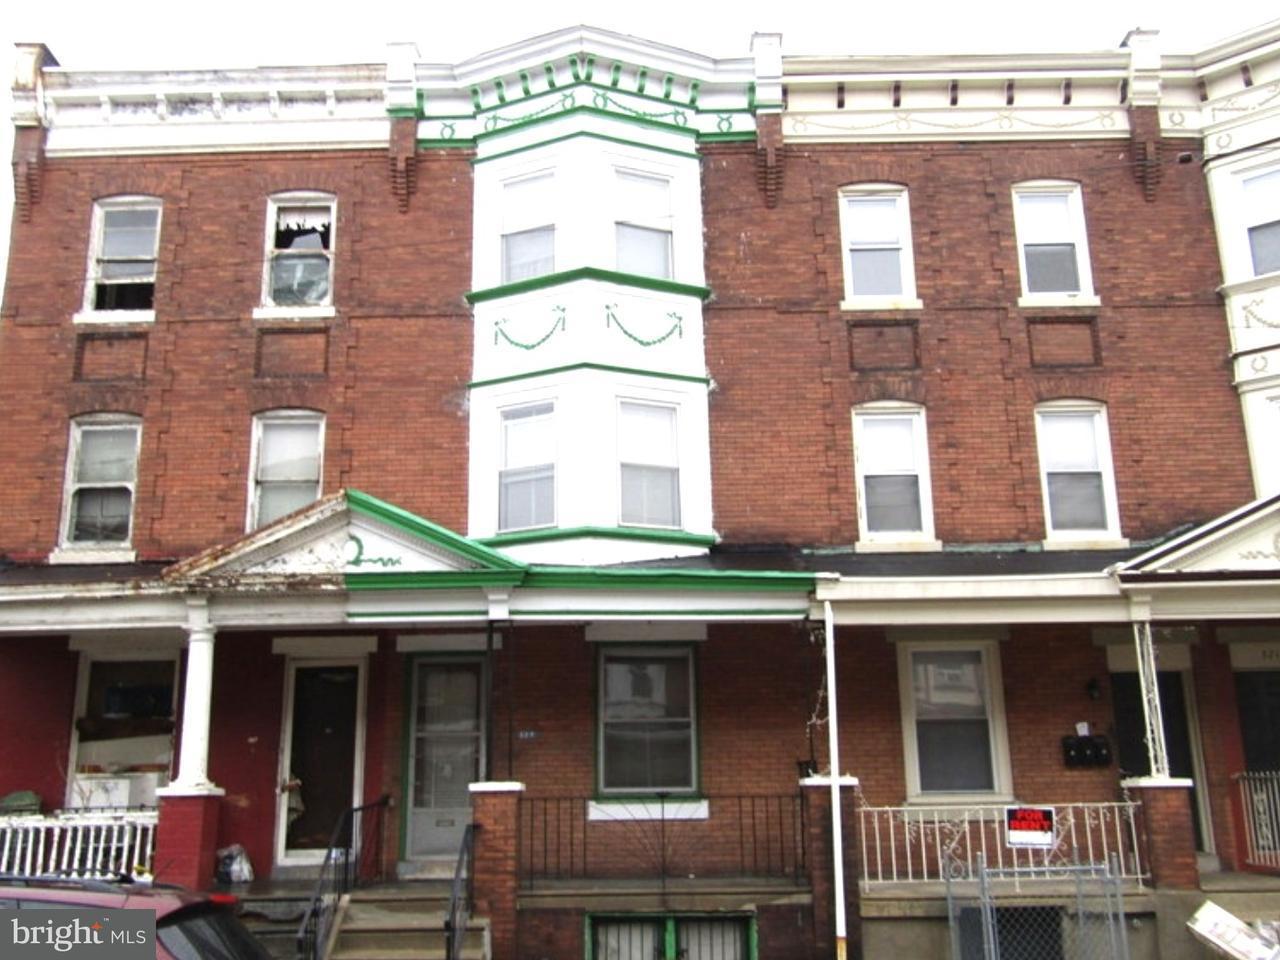 325 N 62ND Philadelphia, PA 19139